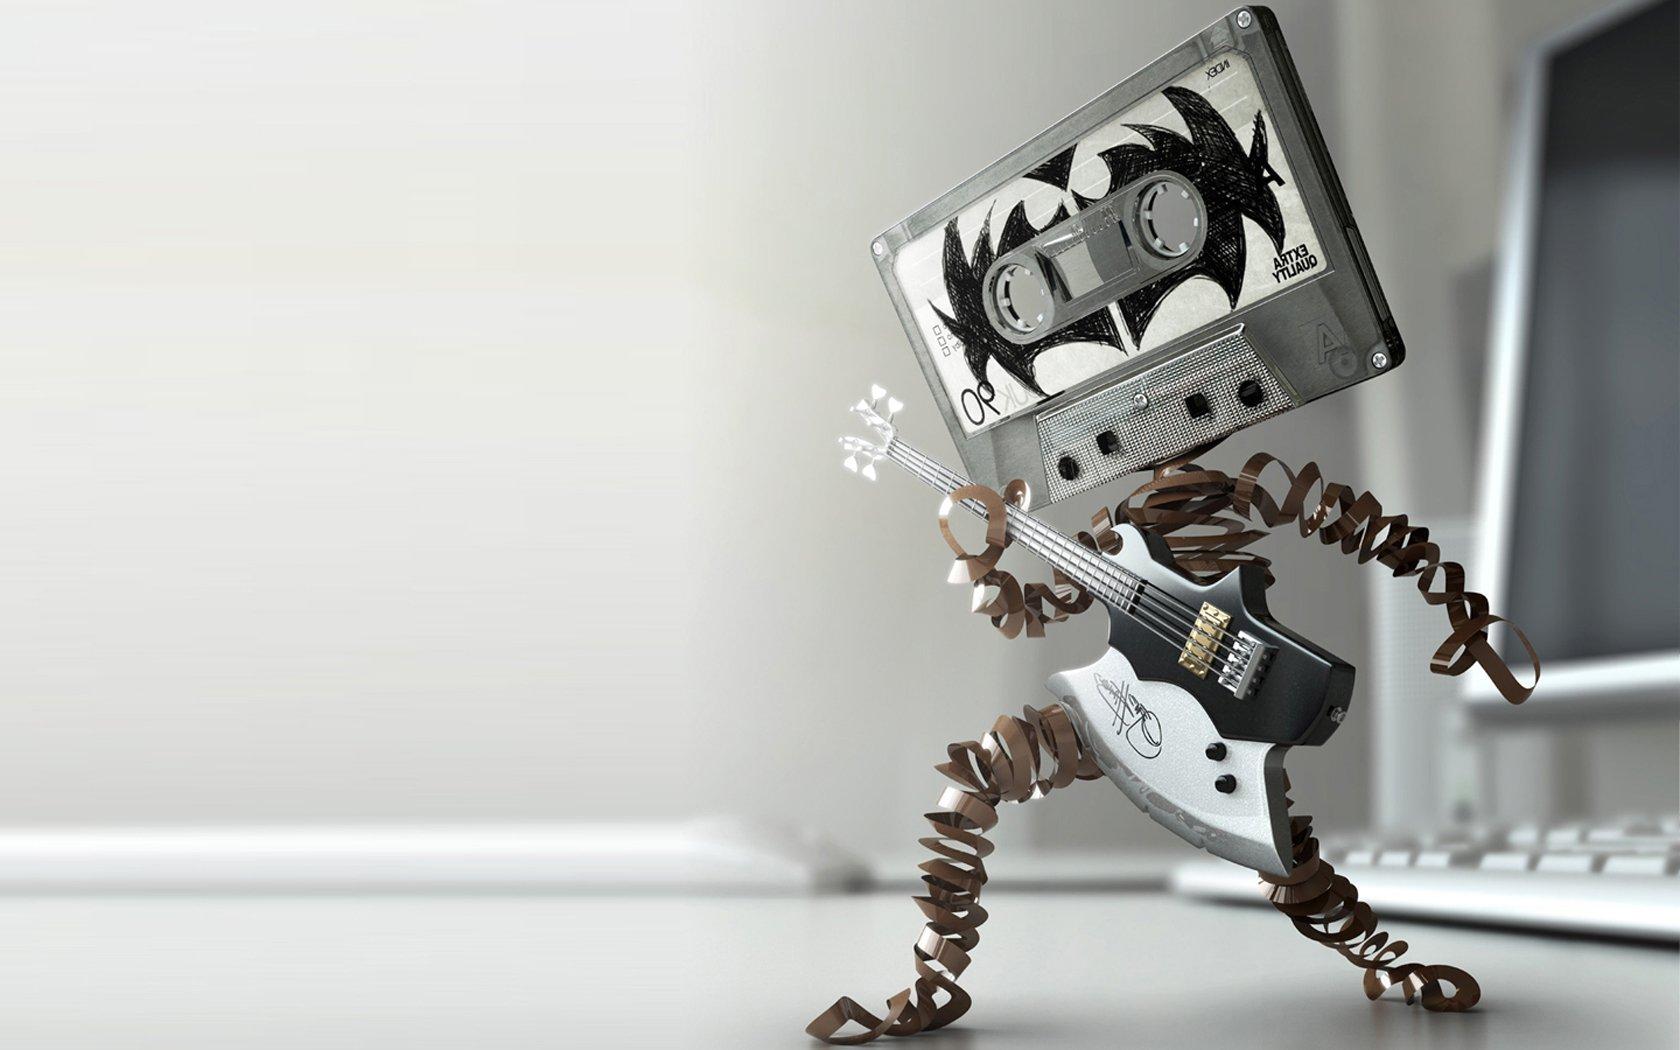 14 cassette hd wallpapers   backgrounds - wallpaper abyss